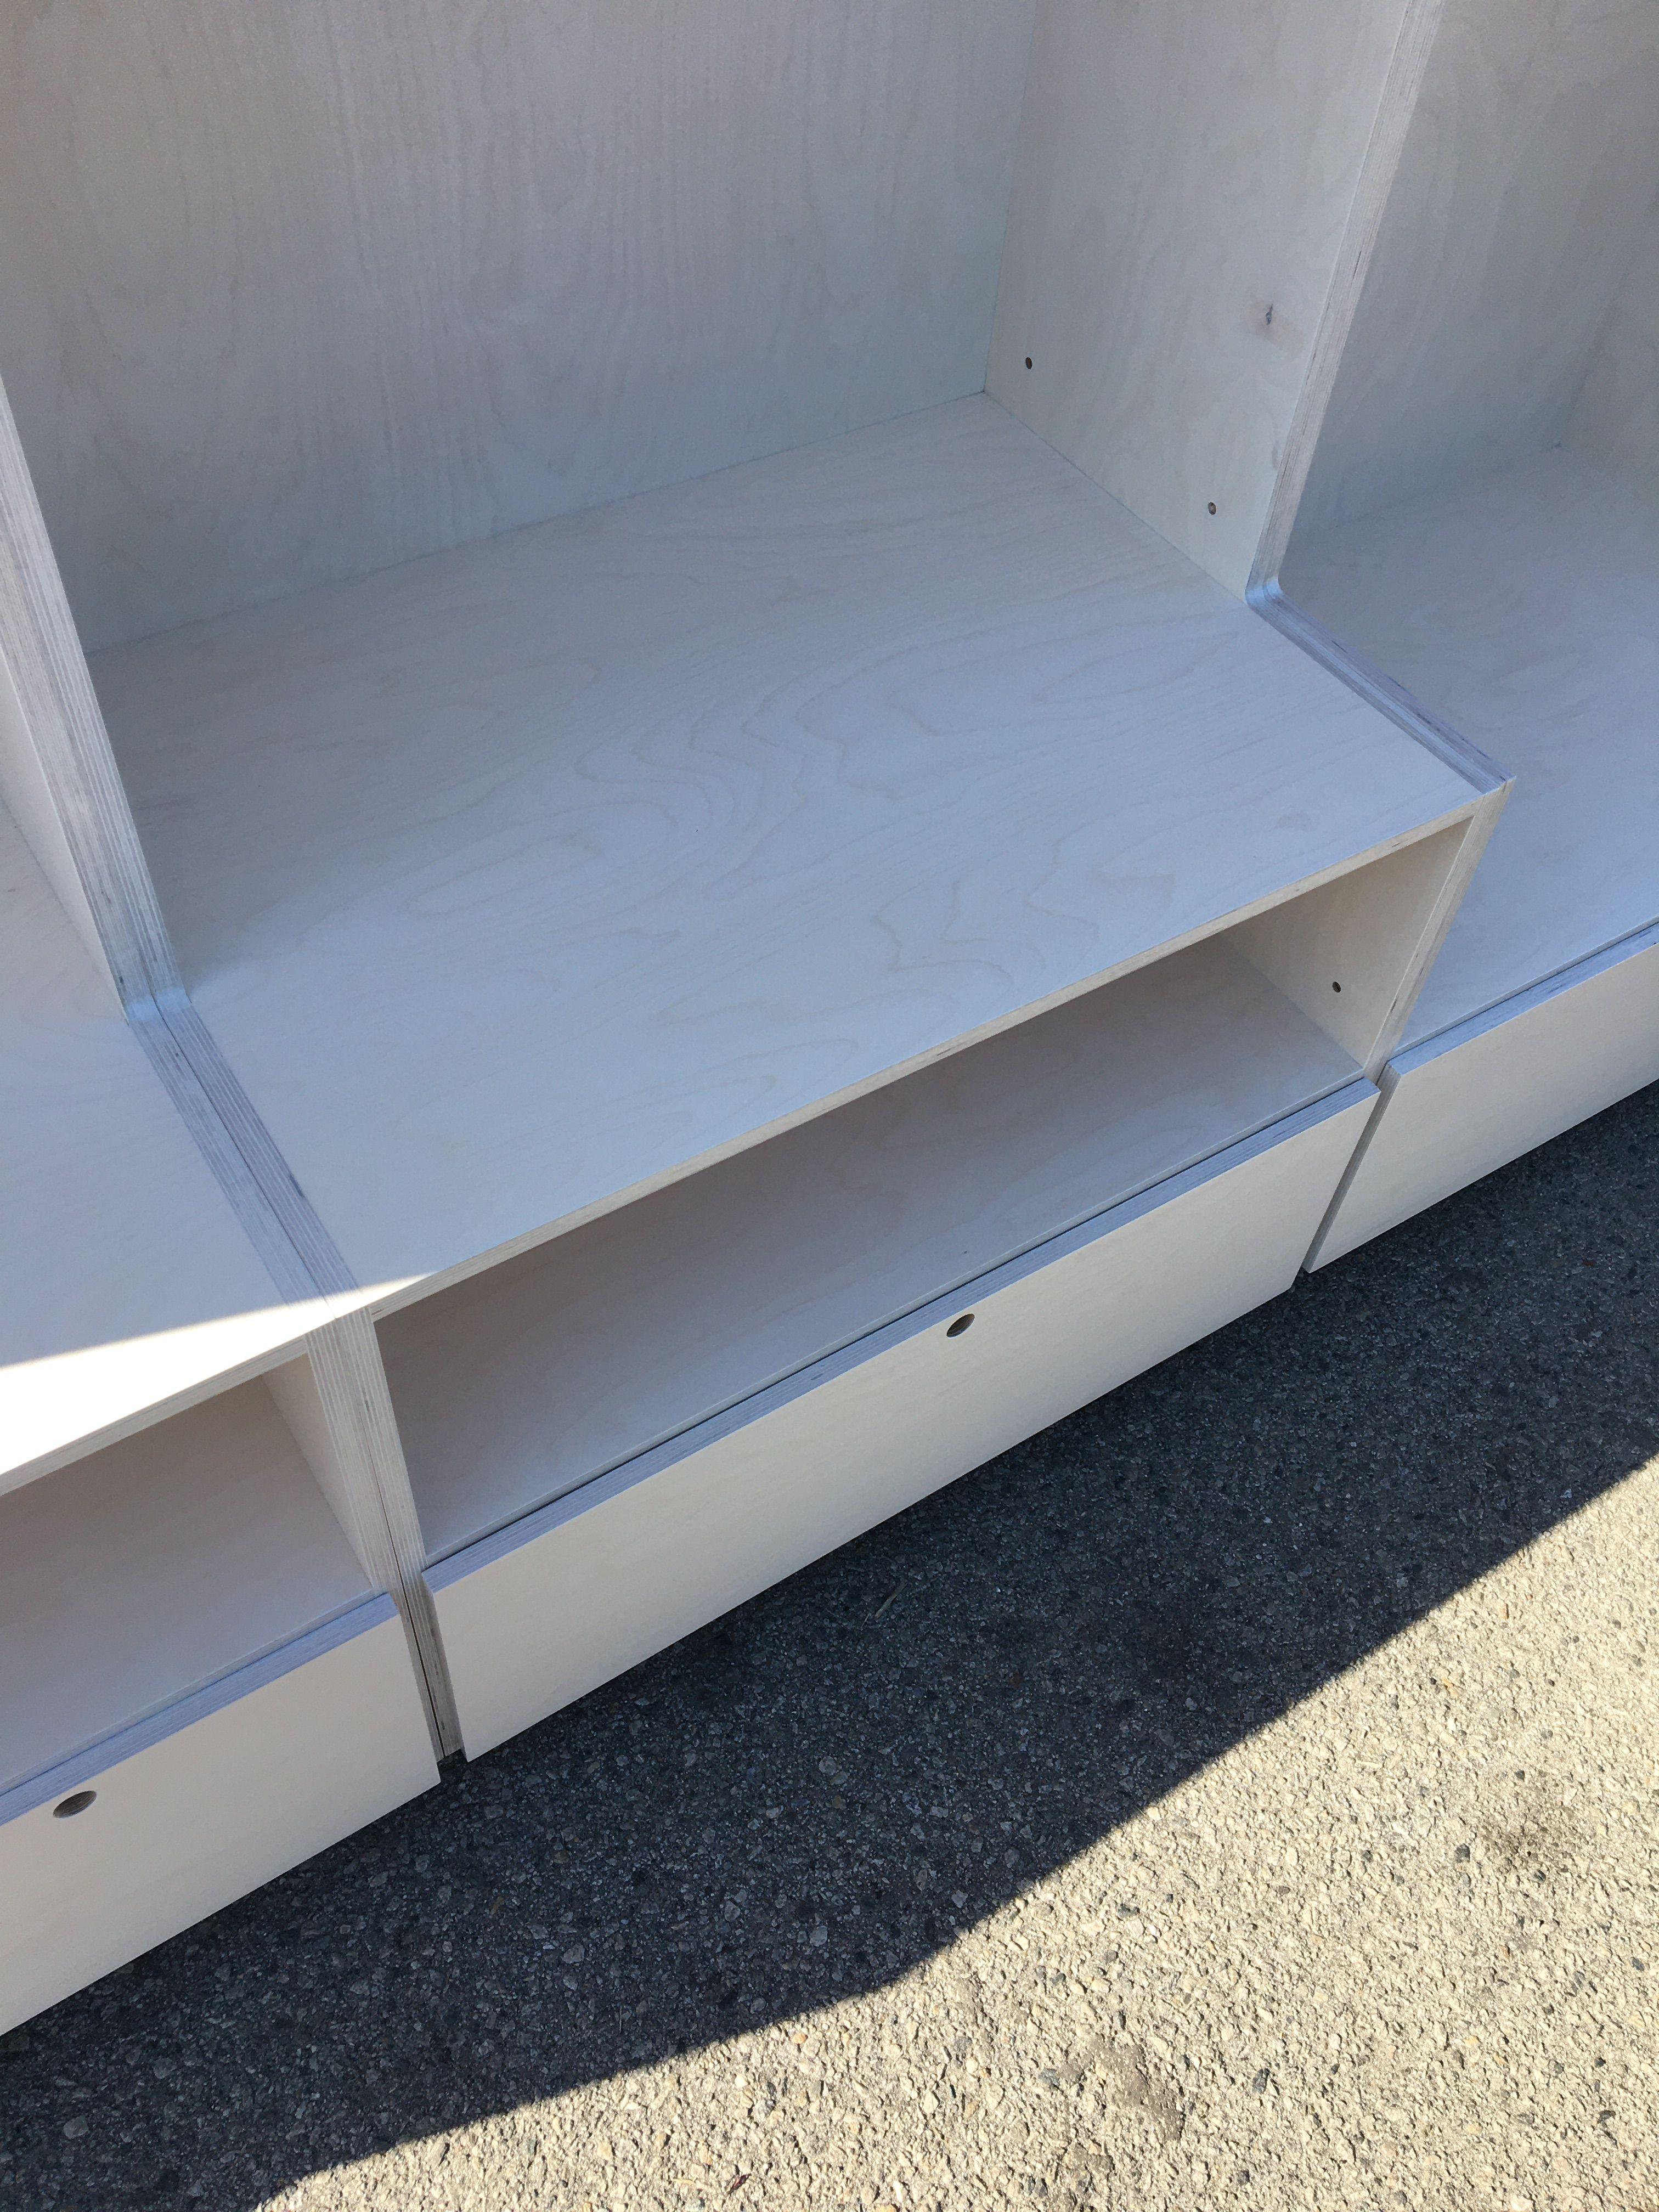 Three Section Closet product image 3